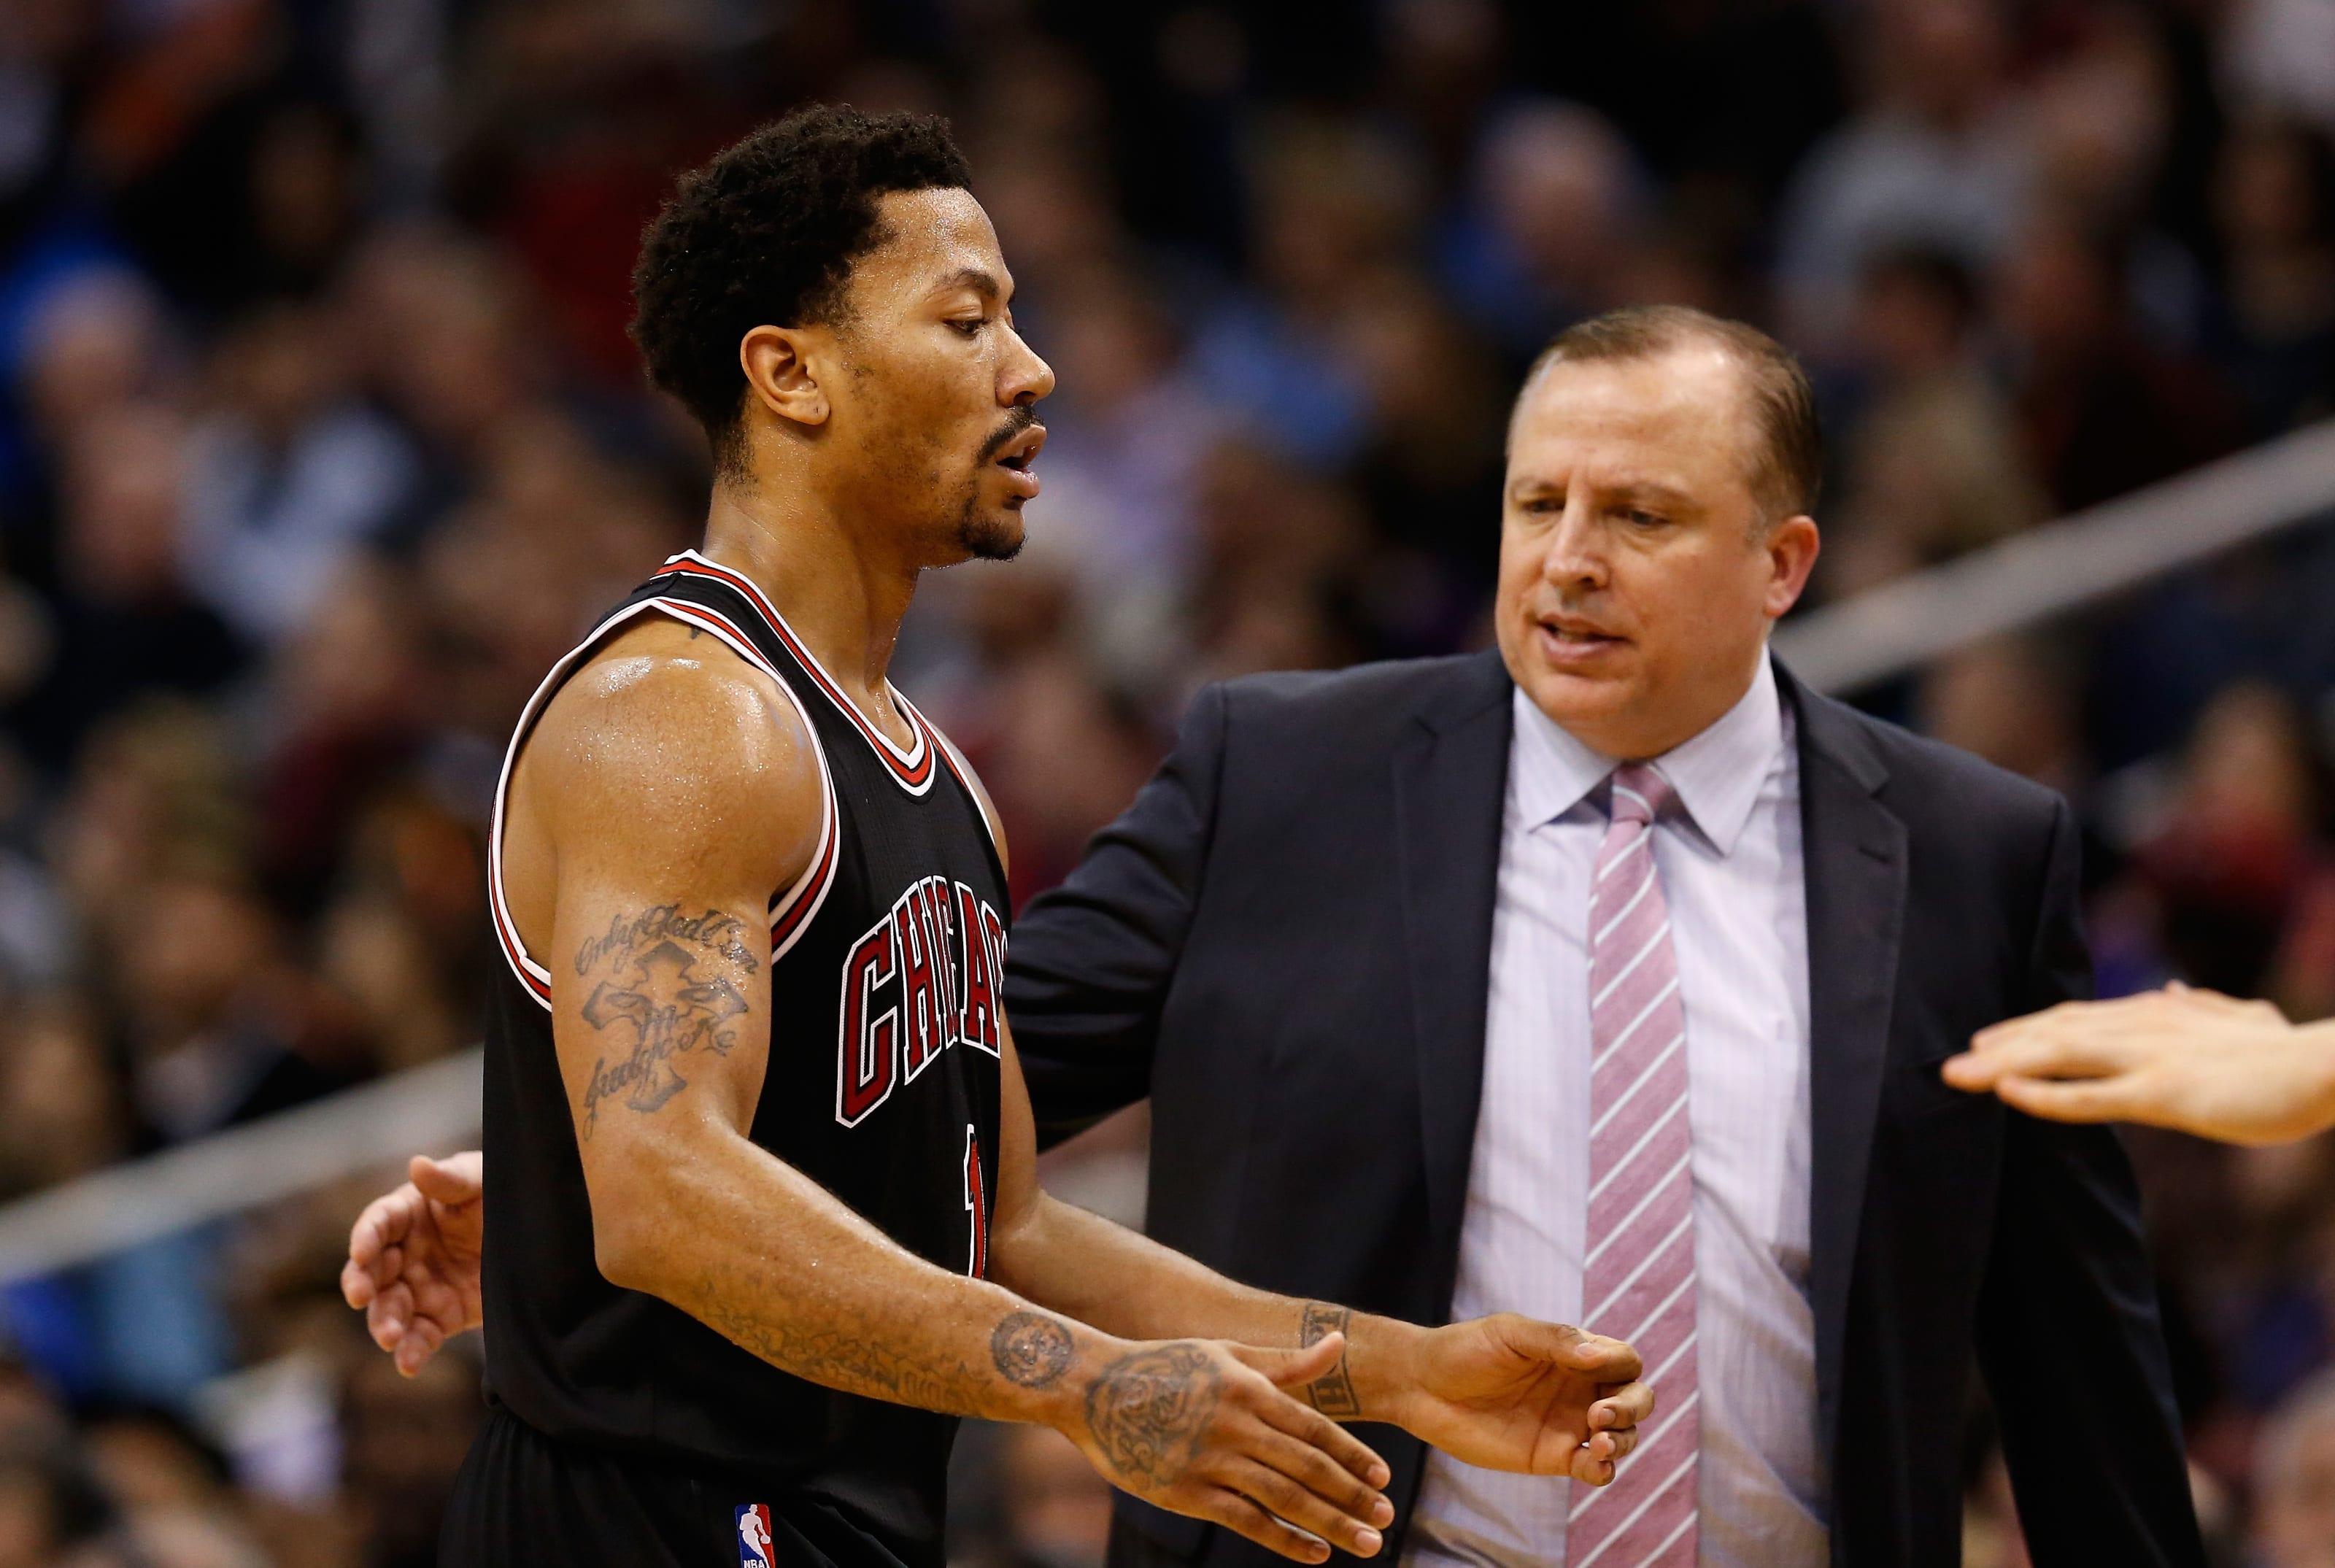 New York Knicks: The Derrick Rose trade should challenge Tom Thibodeau